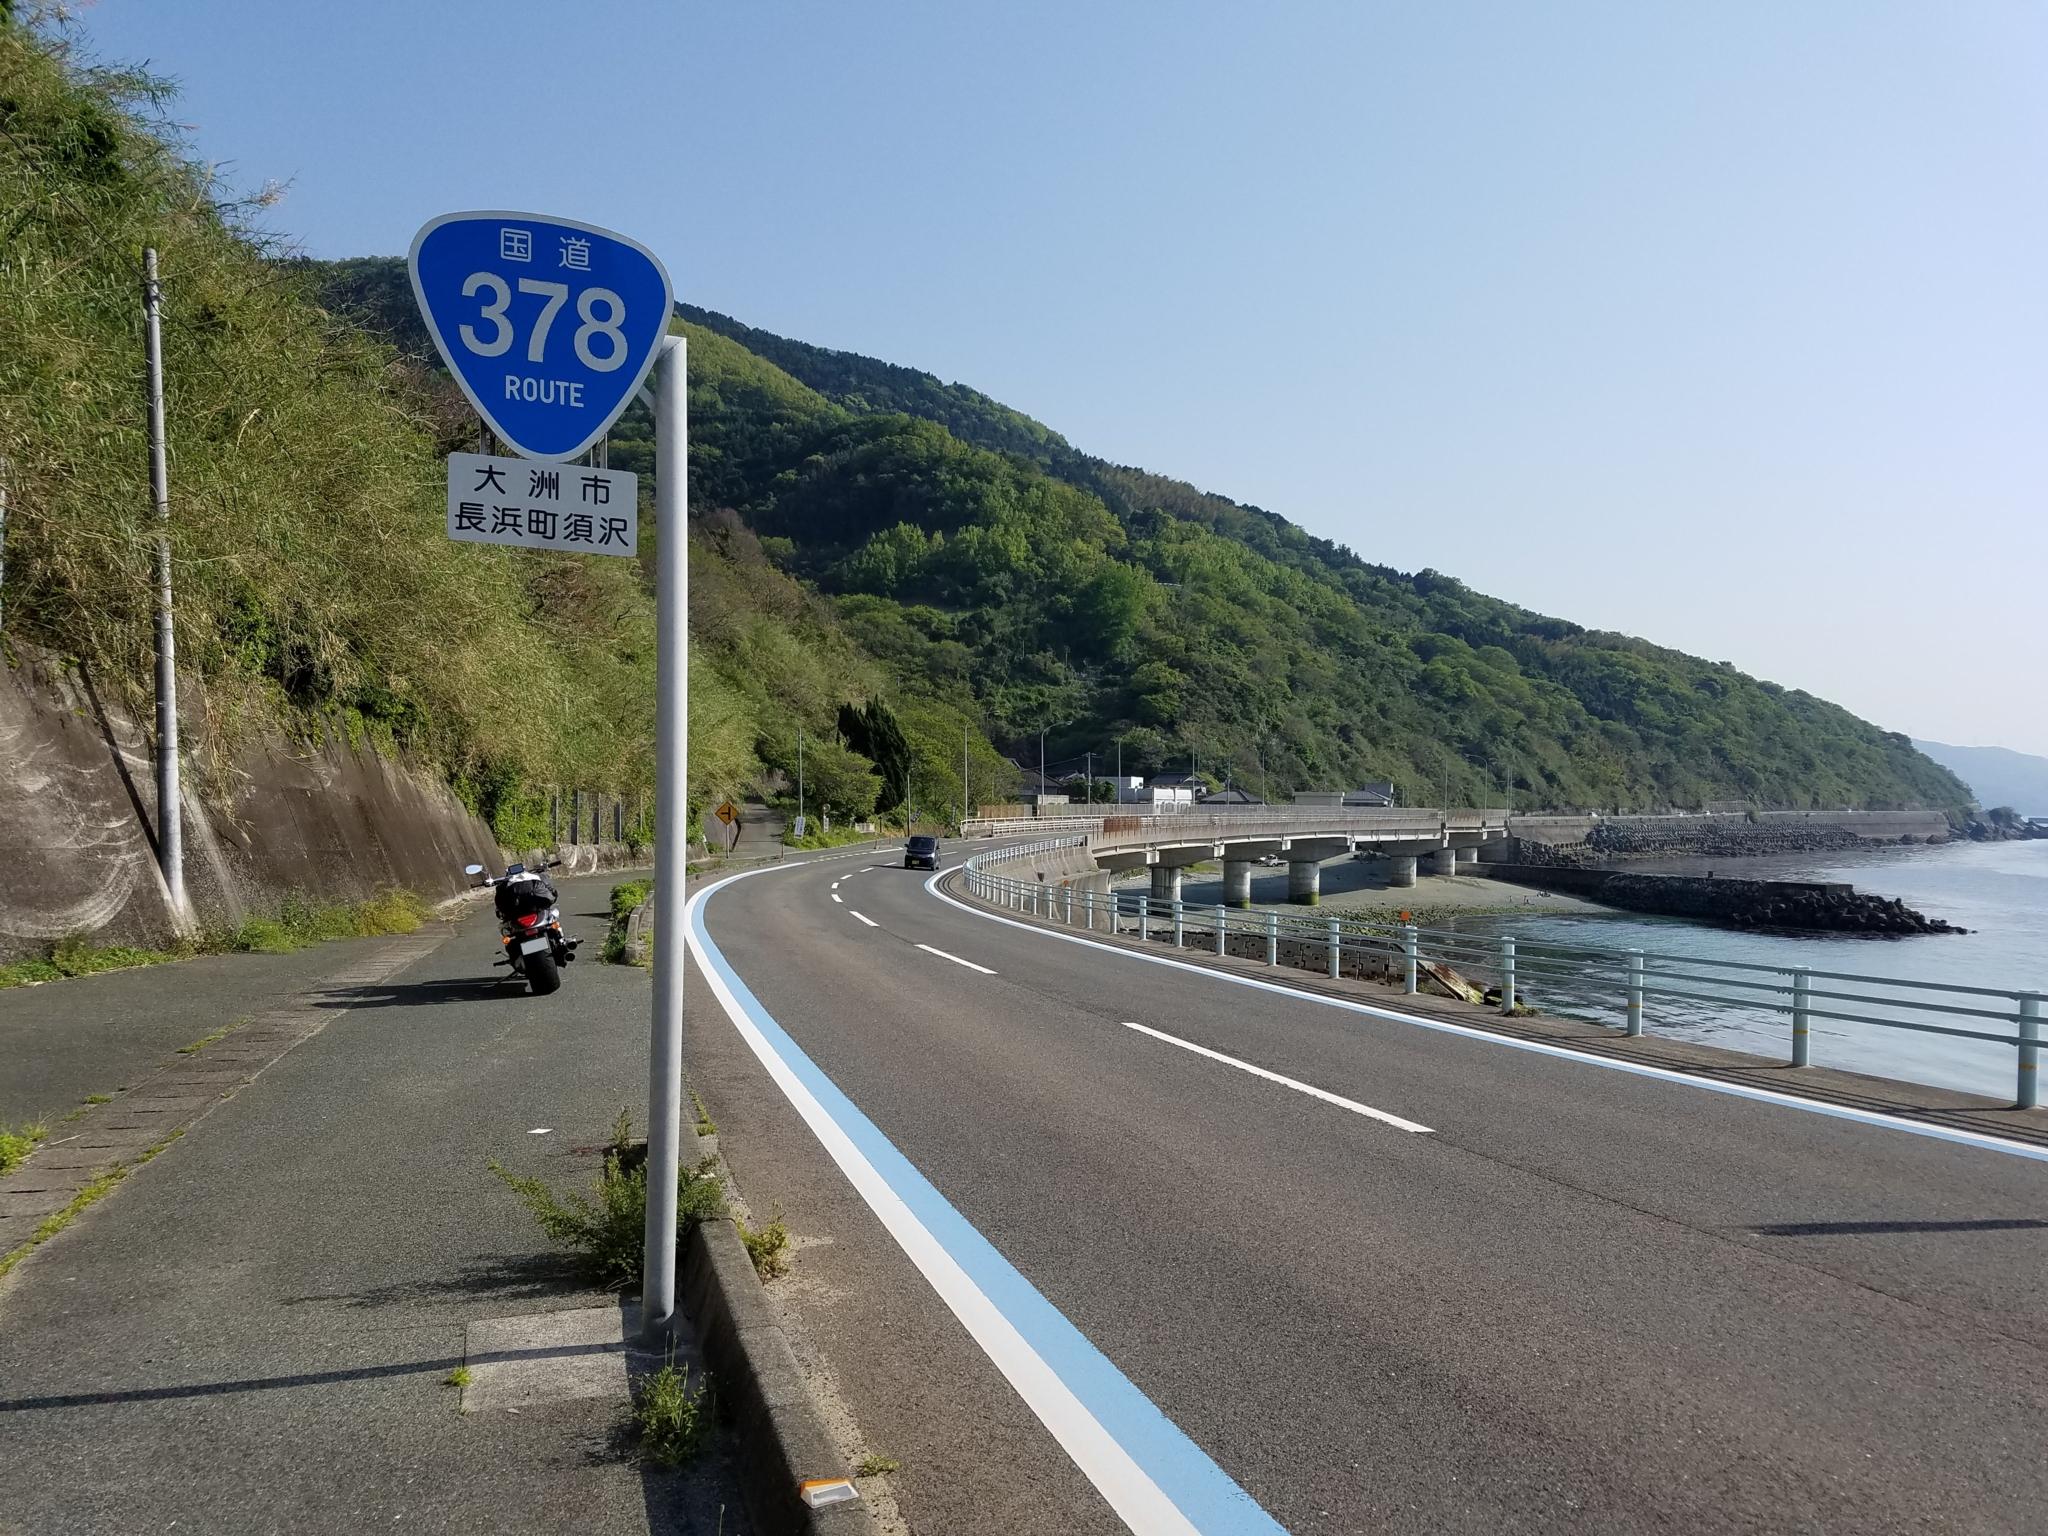 f:id:ToshUeno:20170430155940j:plain